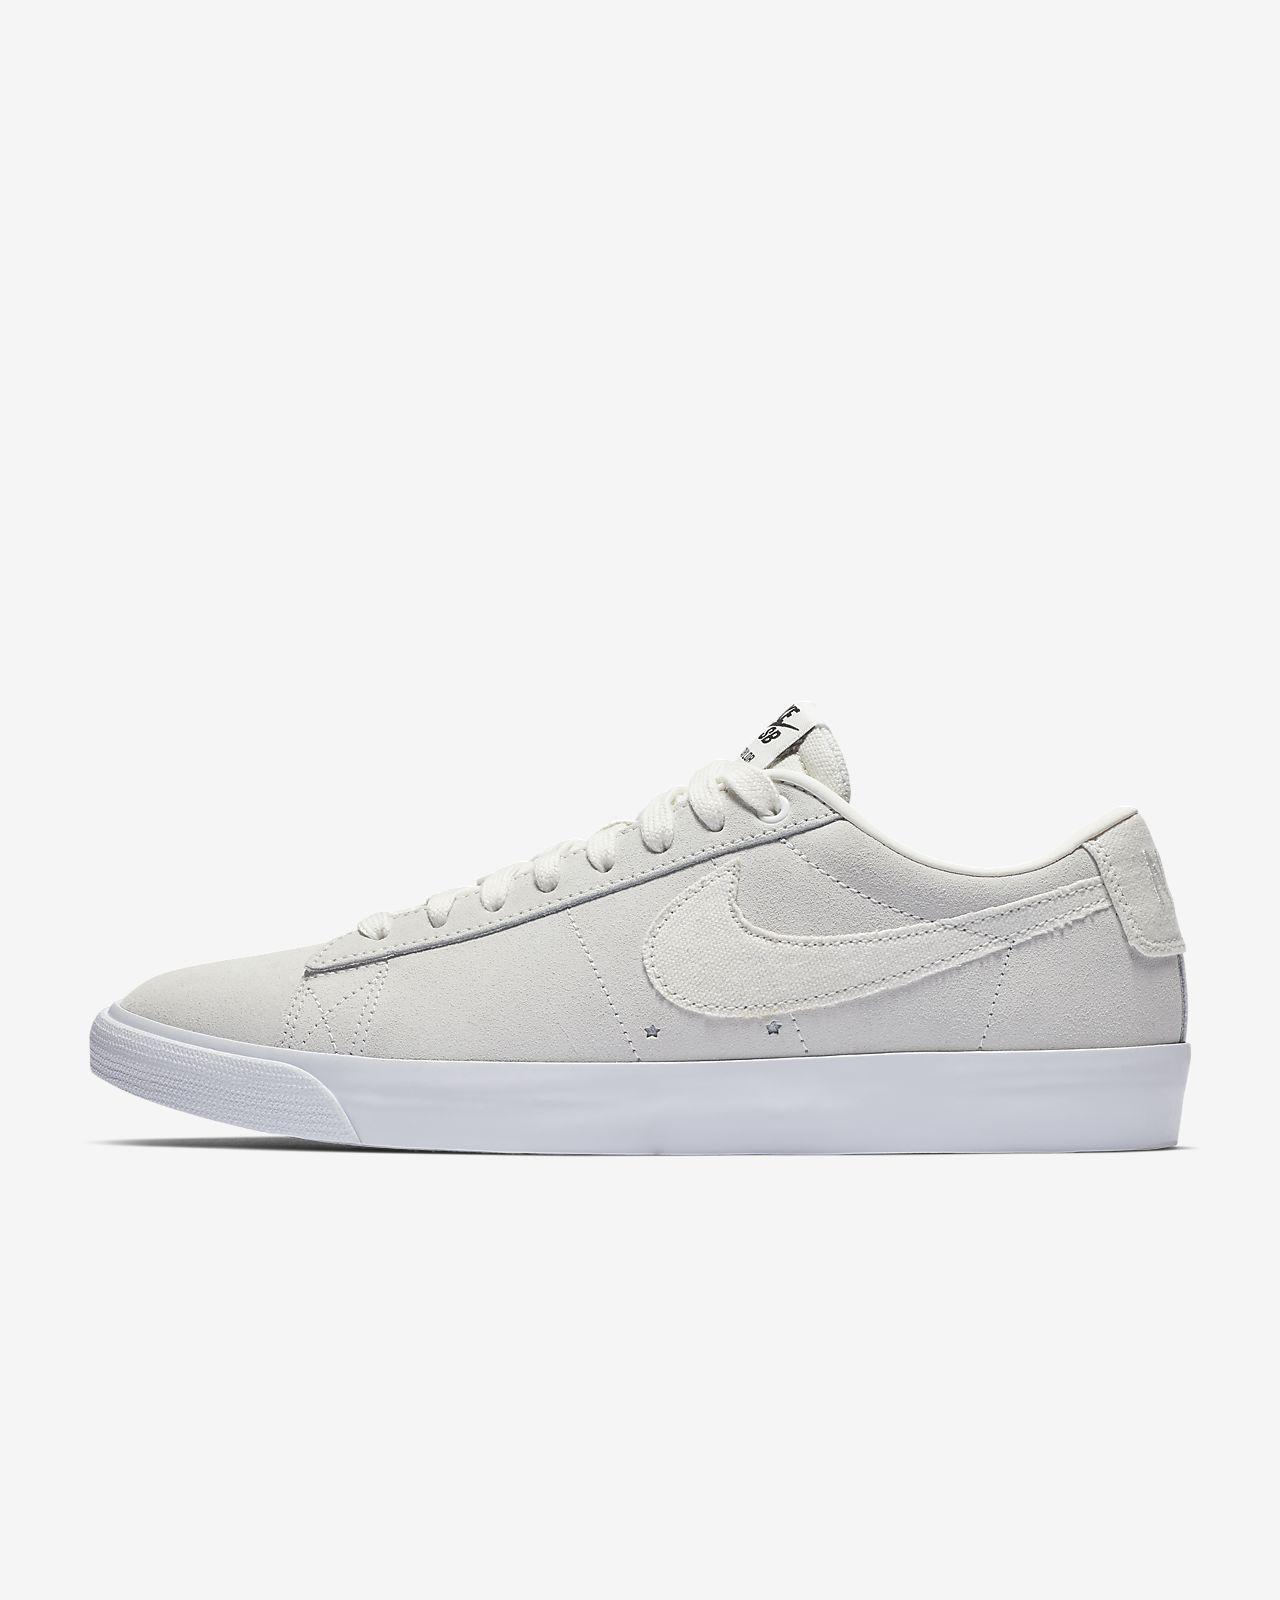 Light Bone Nike Blazer Low Chaussures, Nike Femme Nike